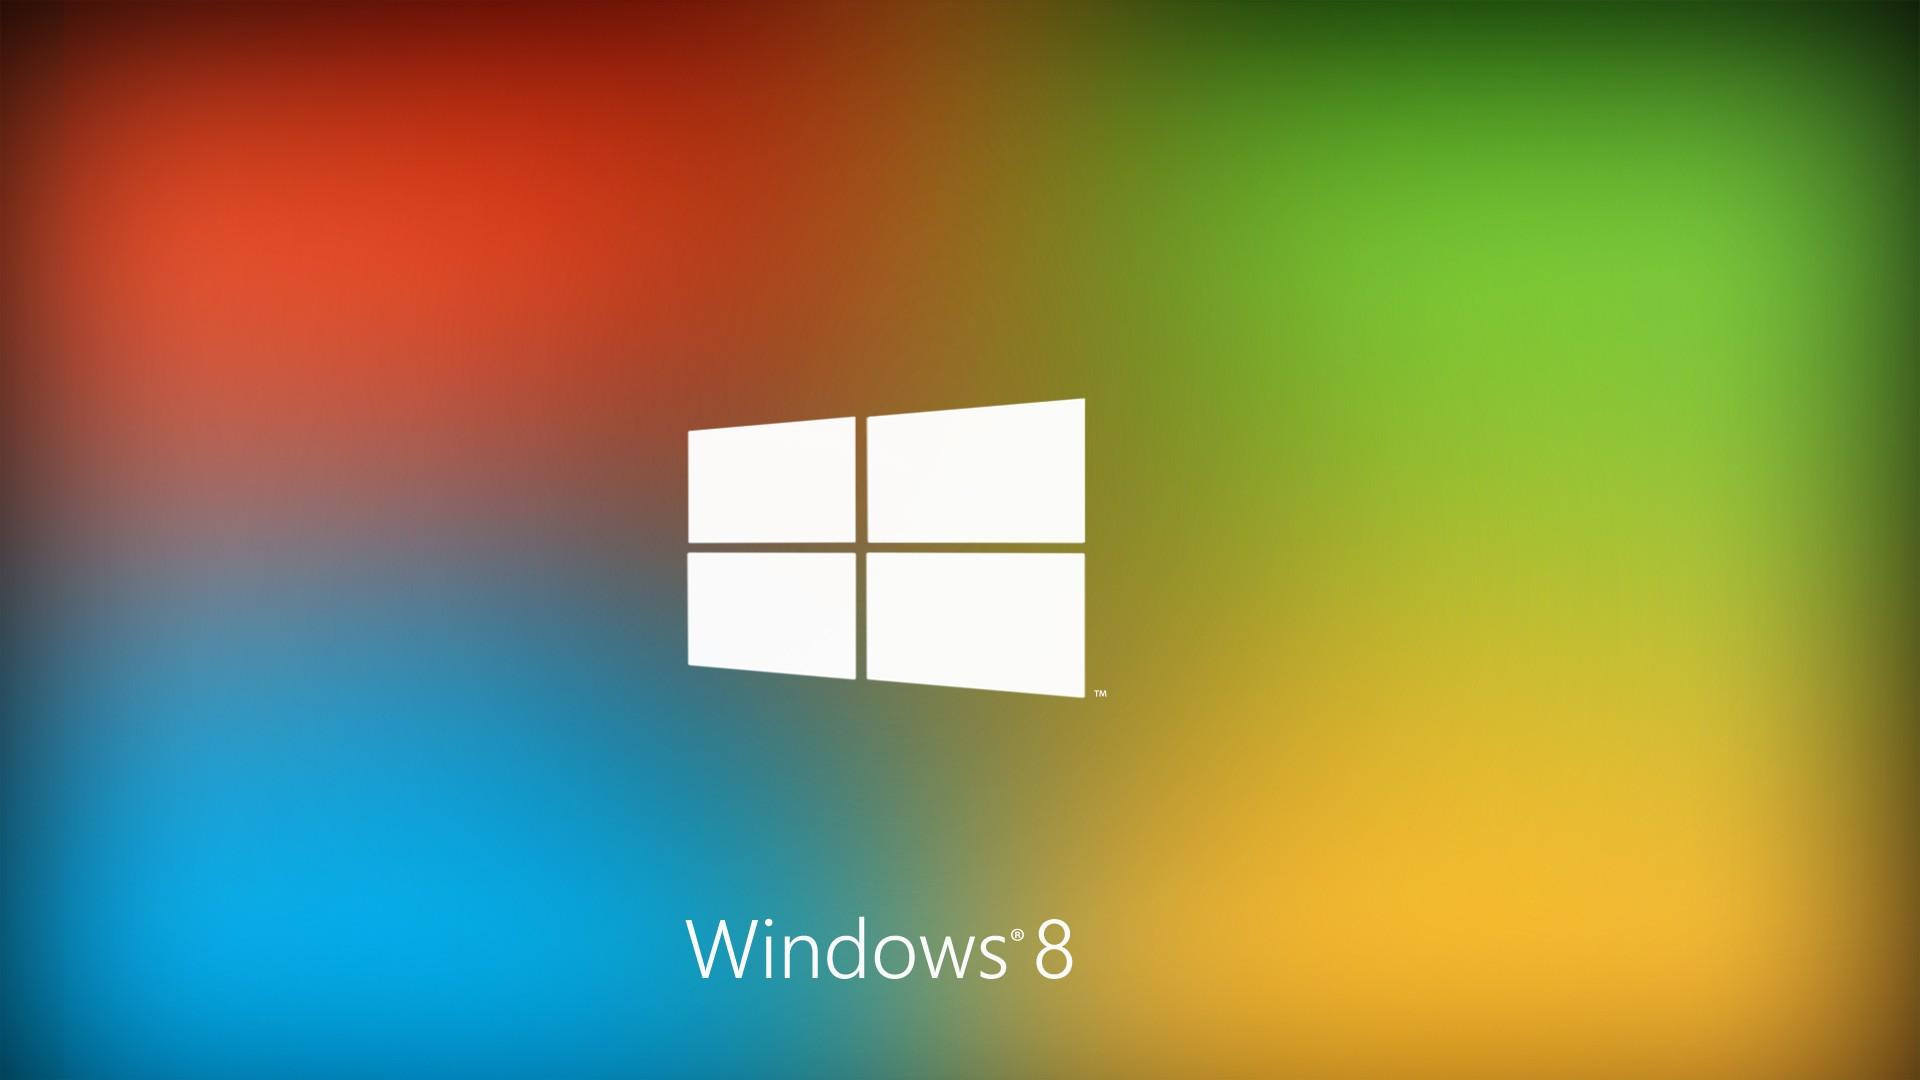 Windows 8 Logo 2013 HD Wallpaper wallpapers55com   Best Wallpapers 1920x1080